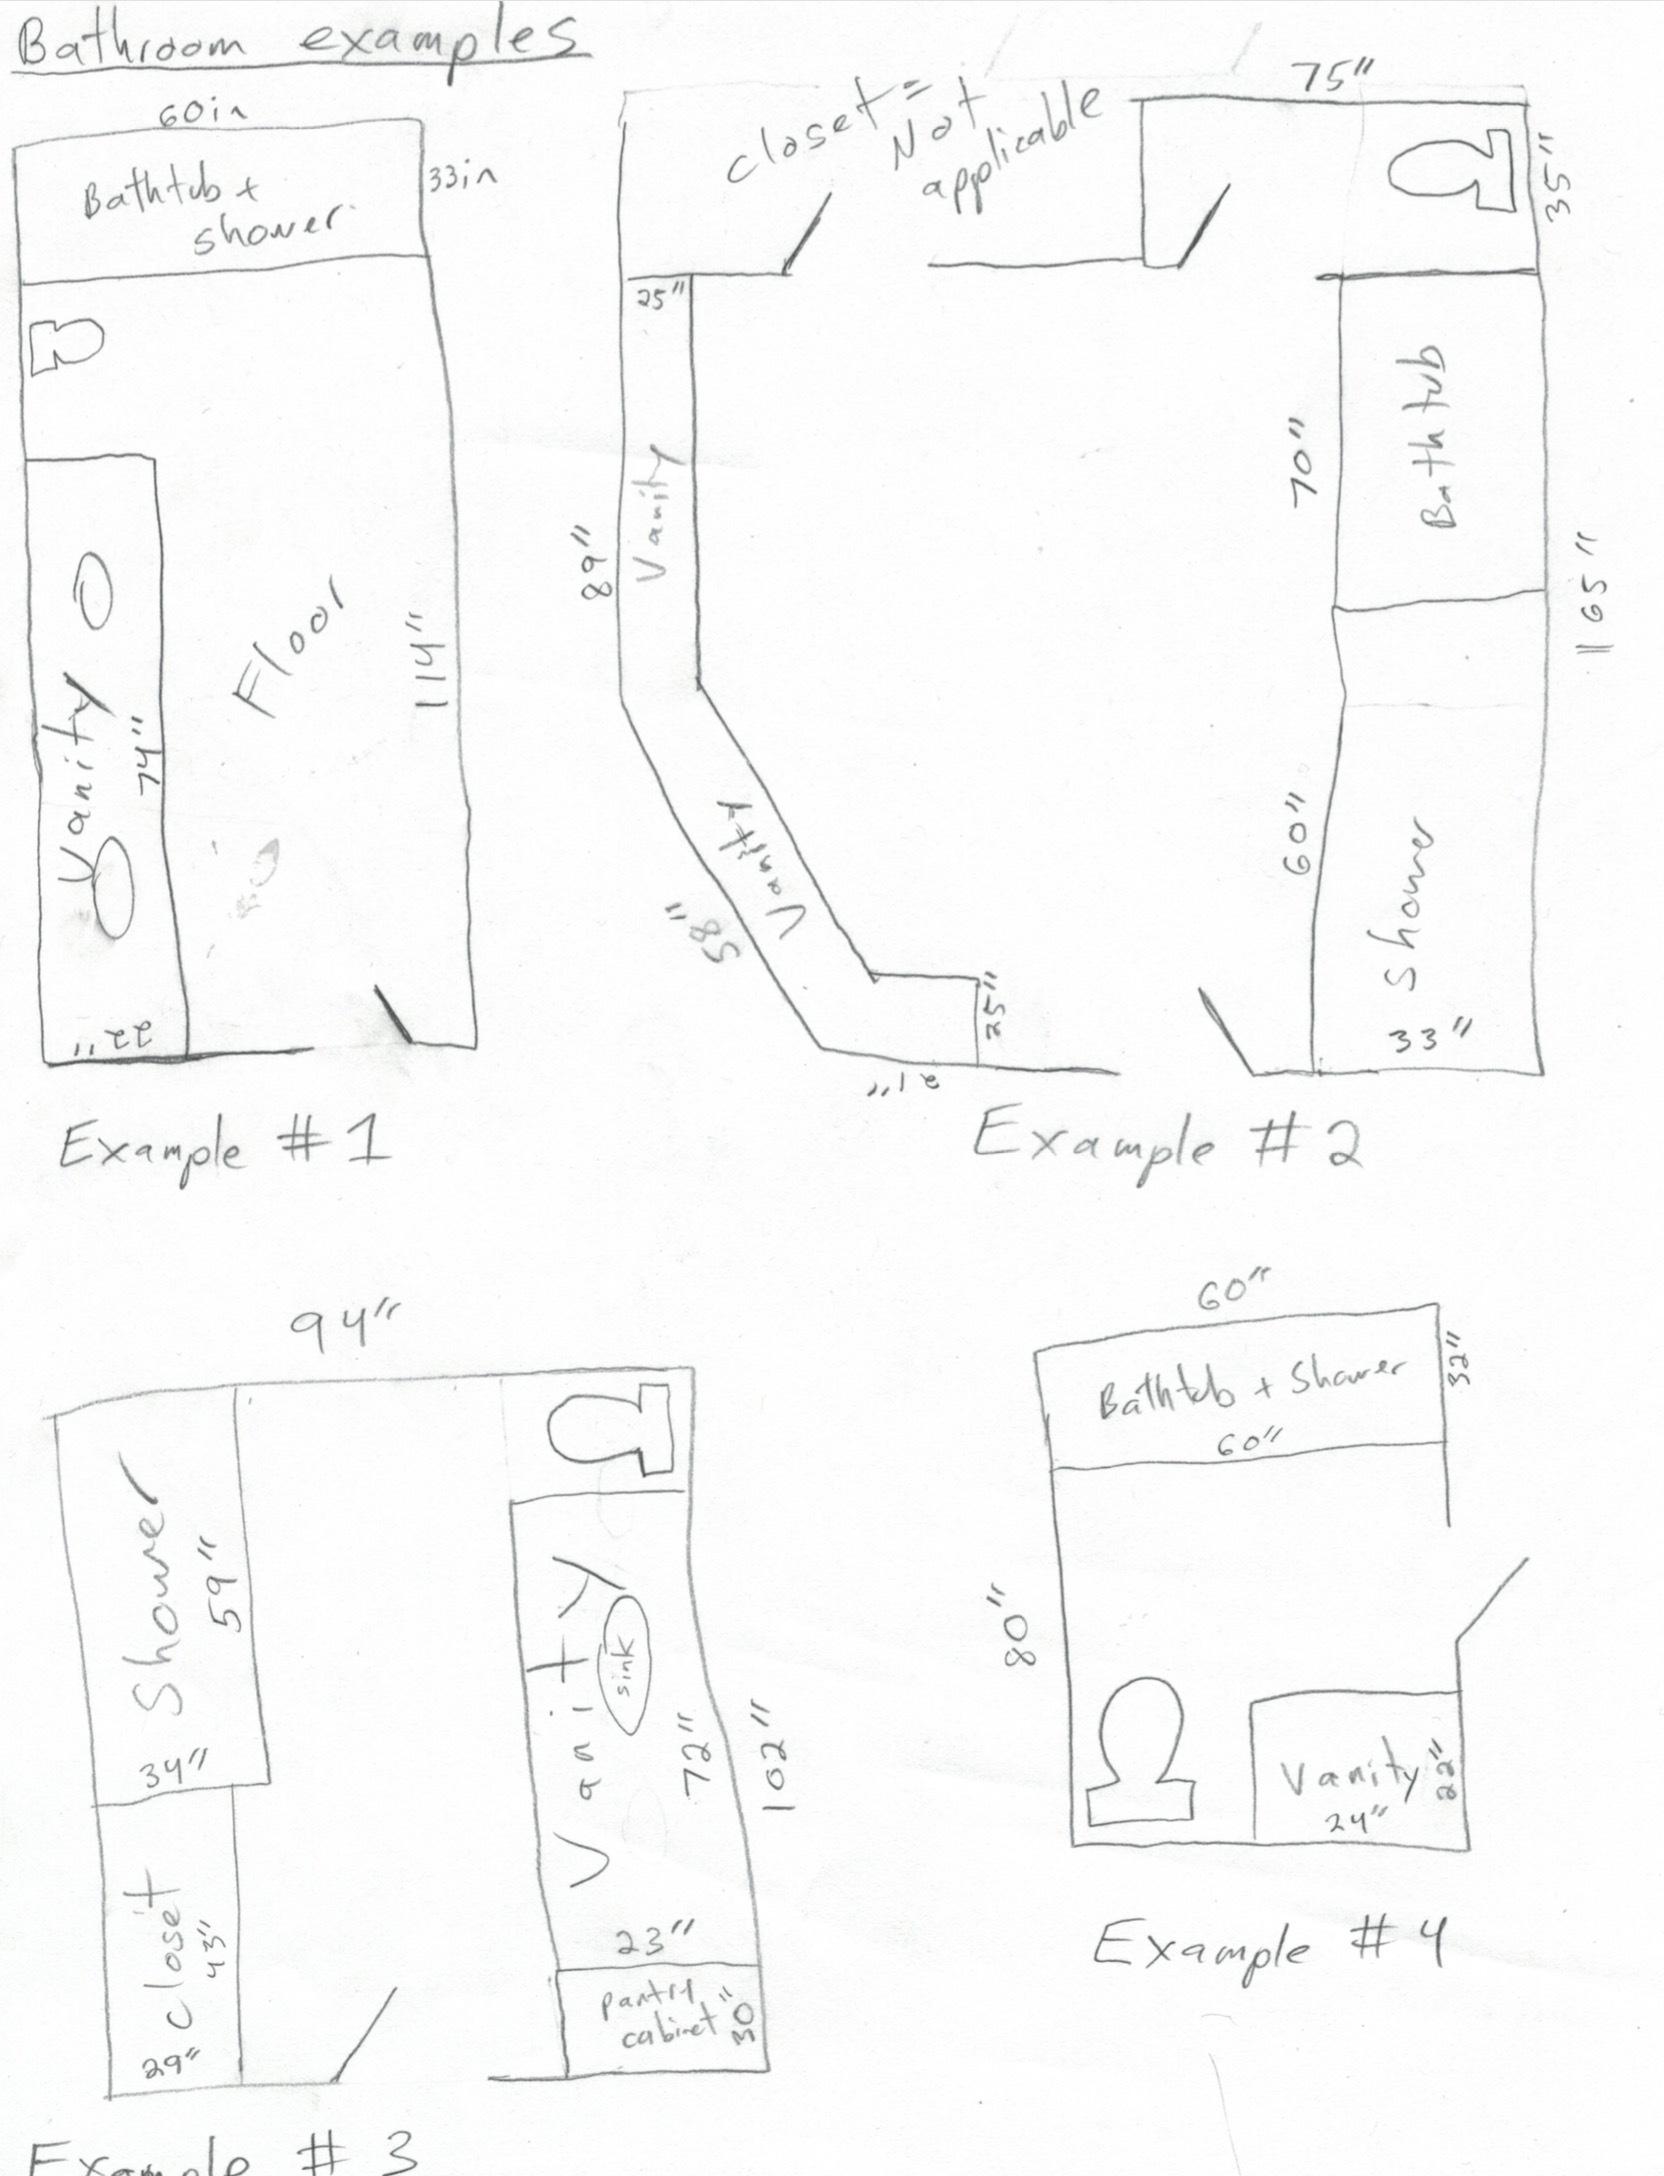 Bathroom remodel drawing examples